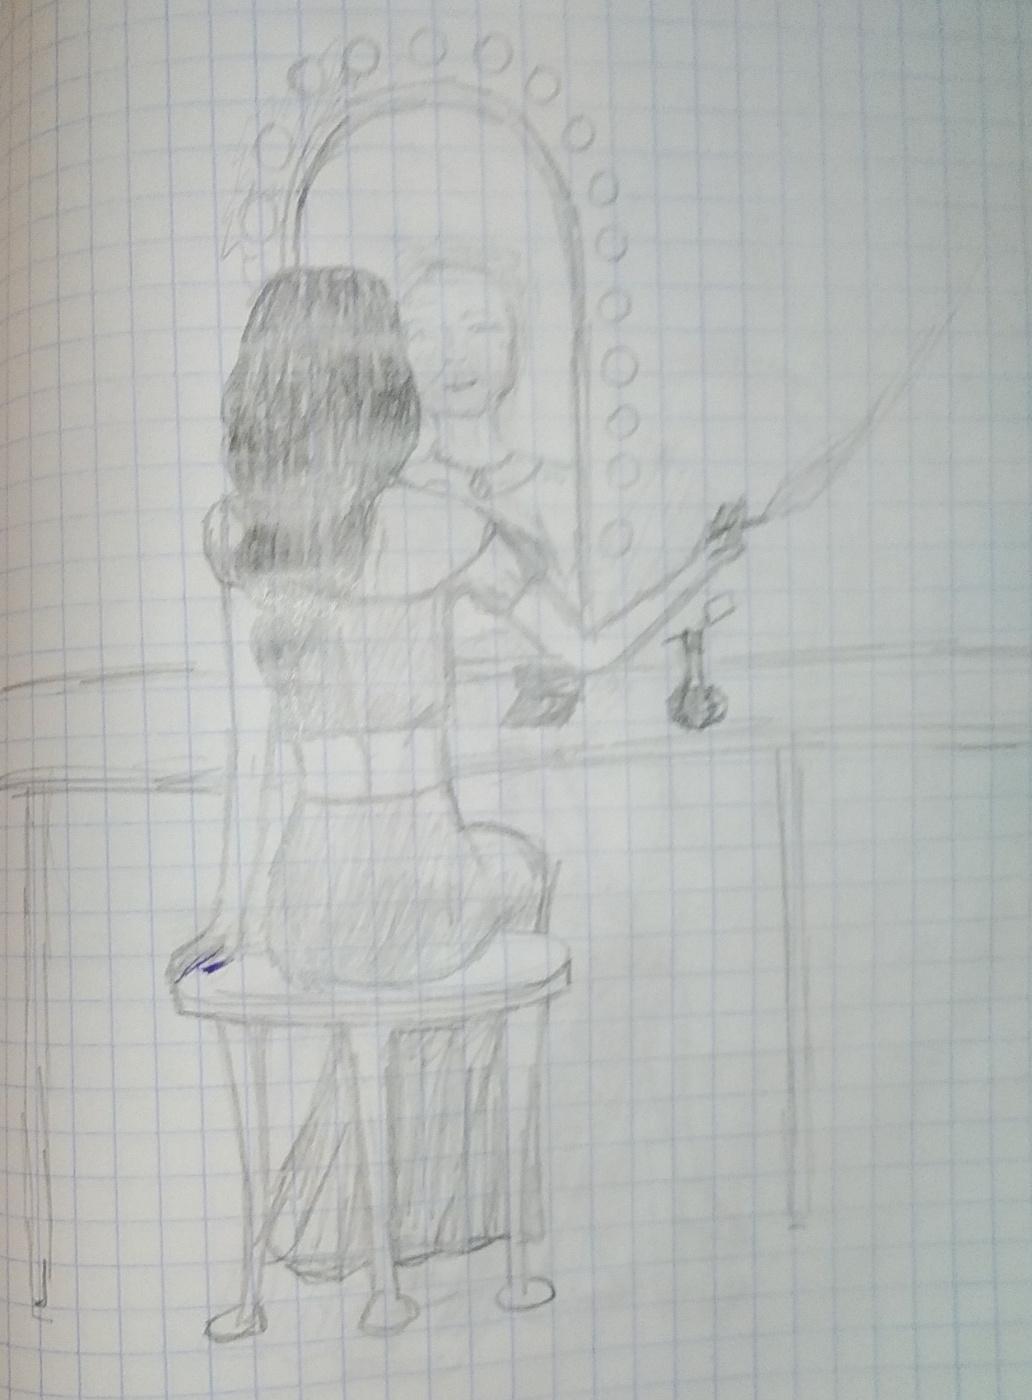 Zina Vladimirovna Parisva. Smoking harm